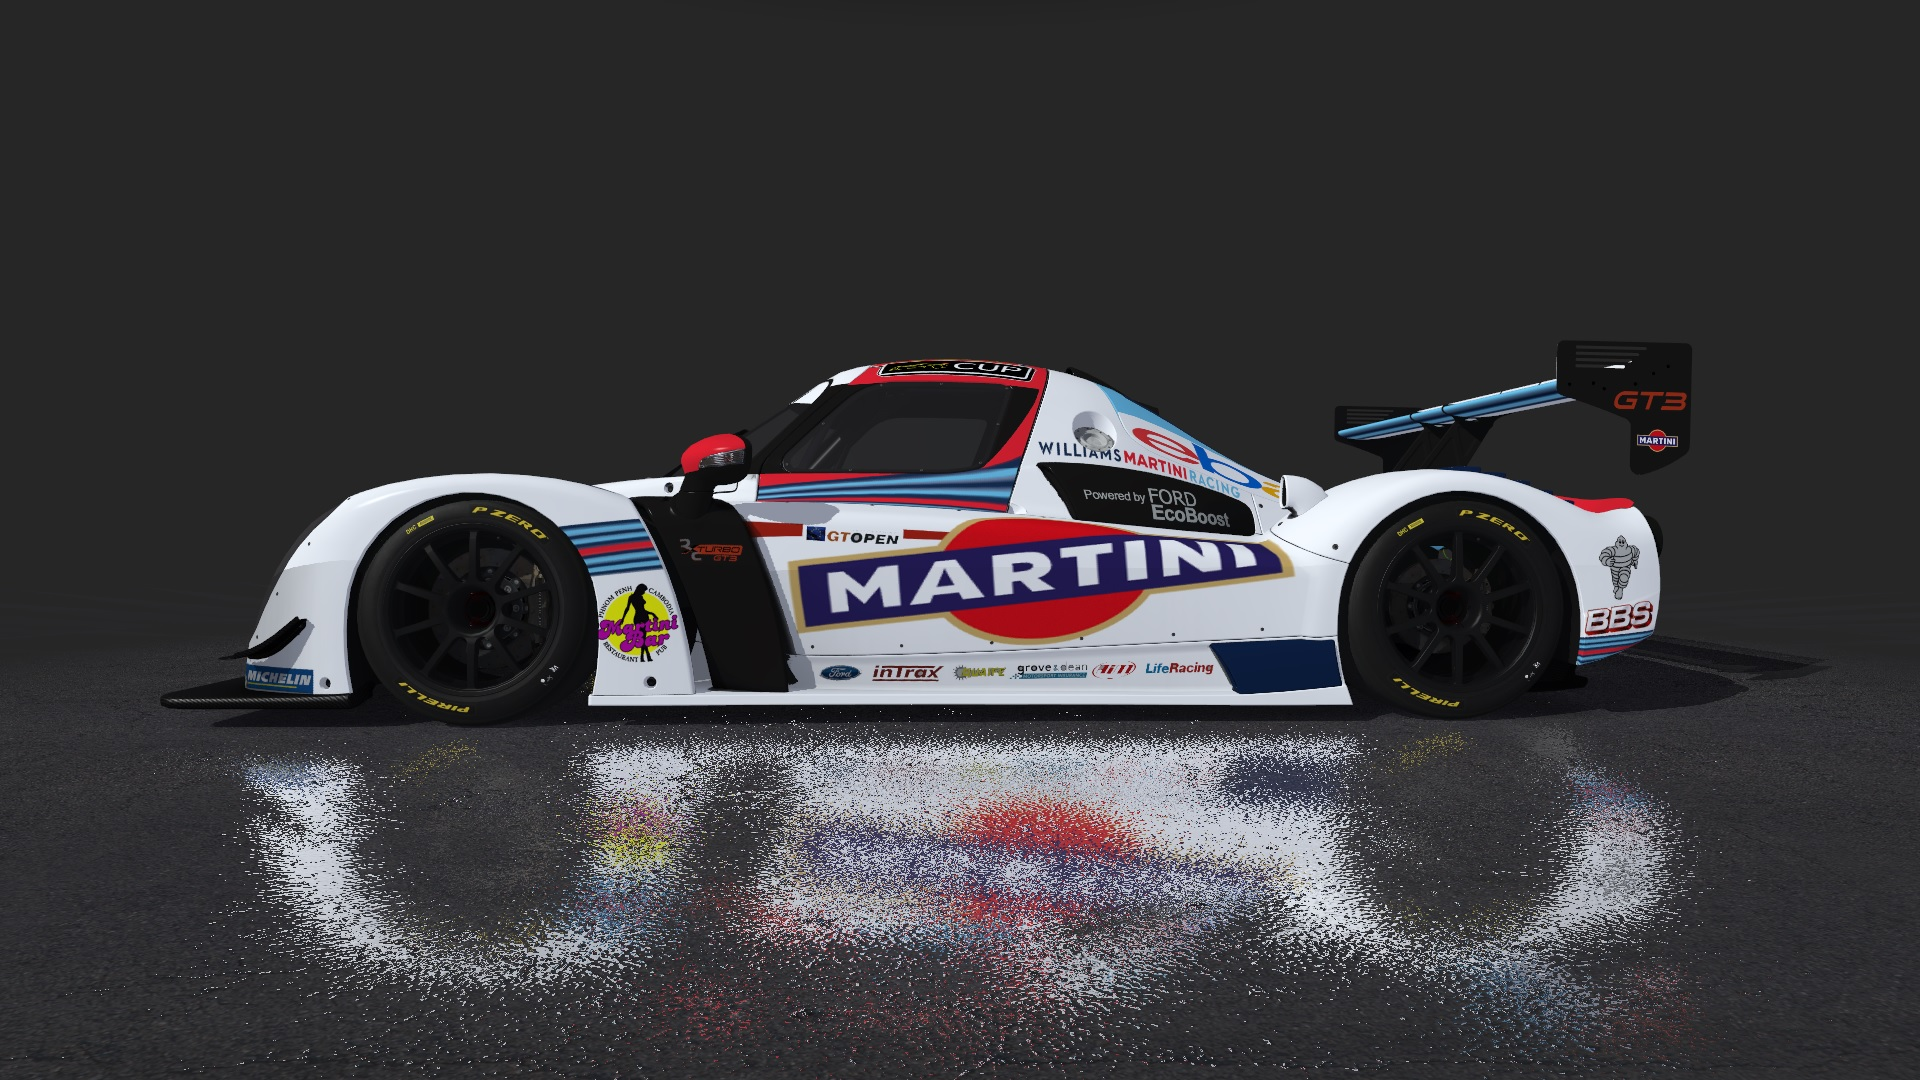 radicalmartini2.jpg